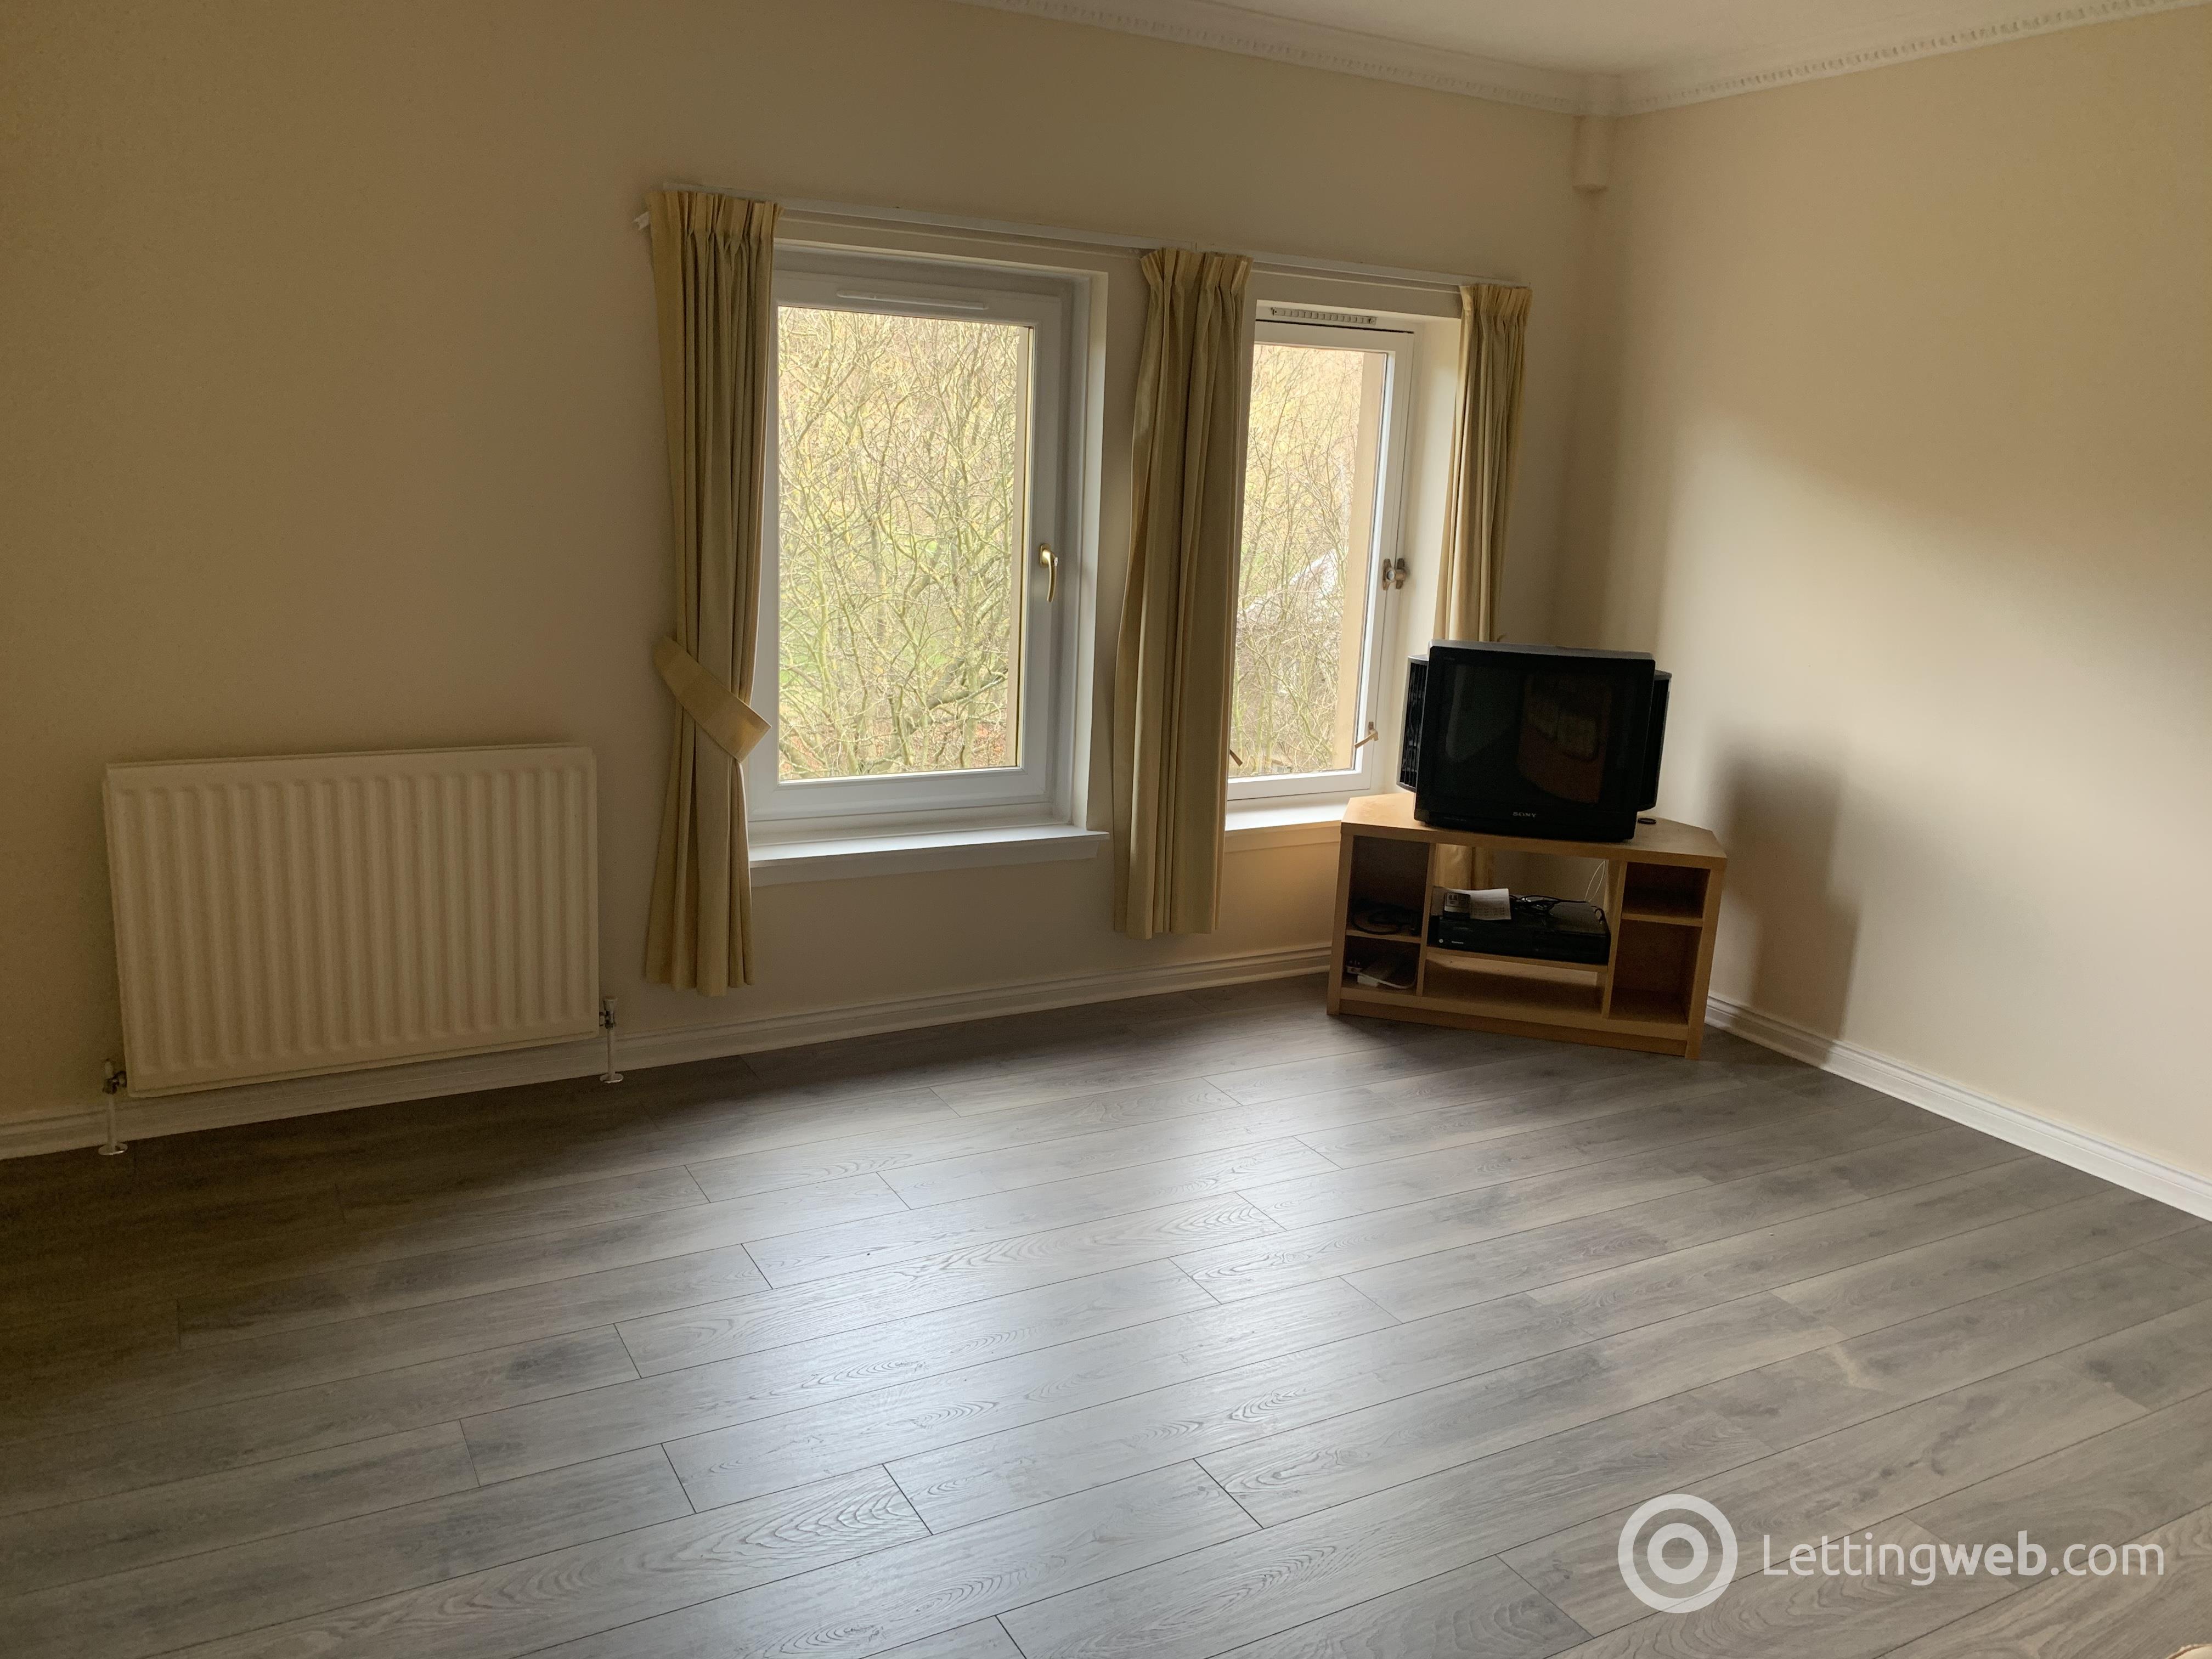 Property to rent in East Parkside, Edinburgh